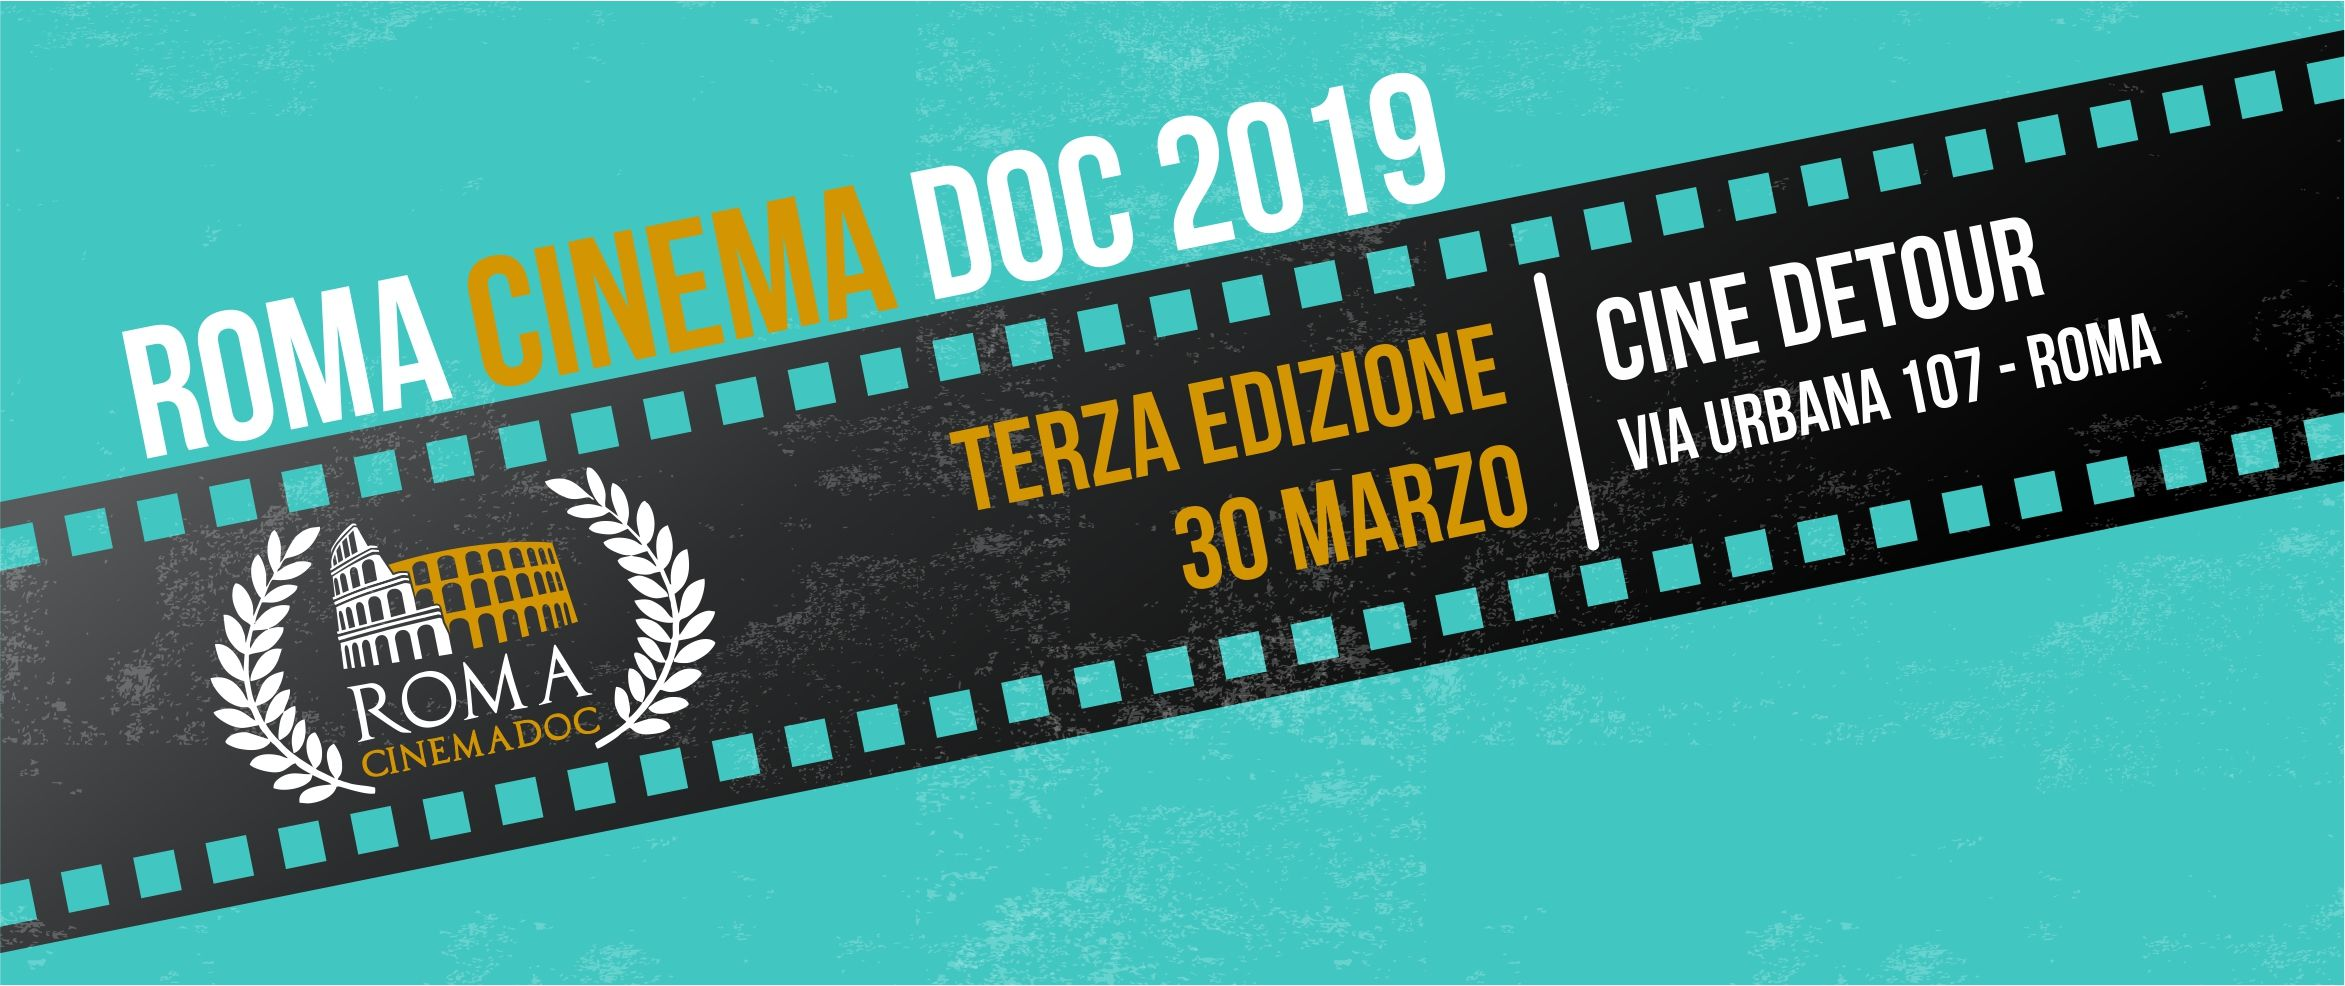 Roma Cinema DOC 2019